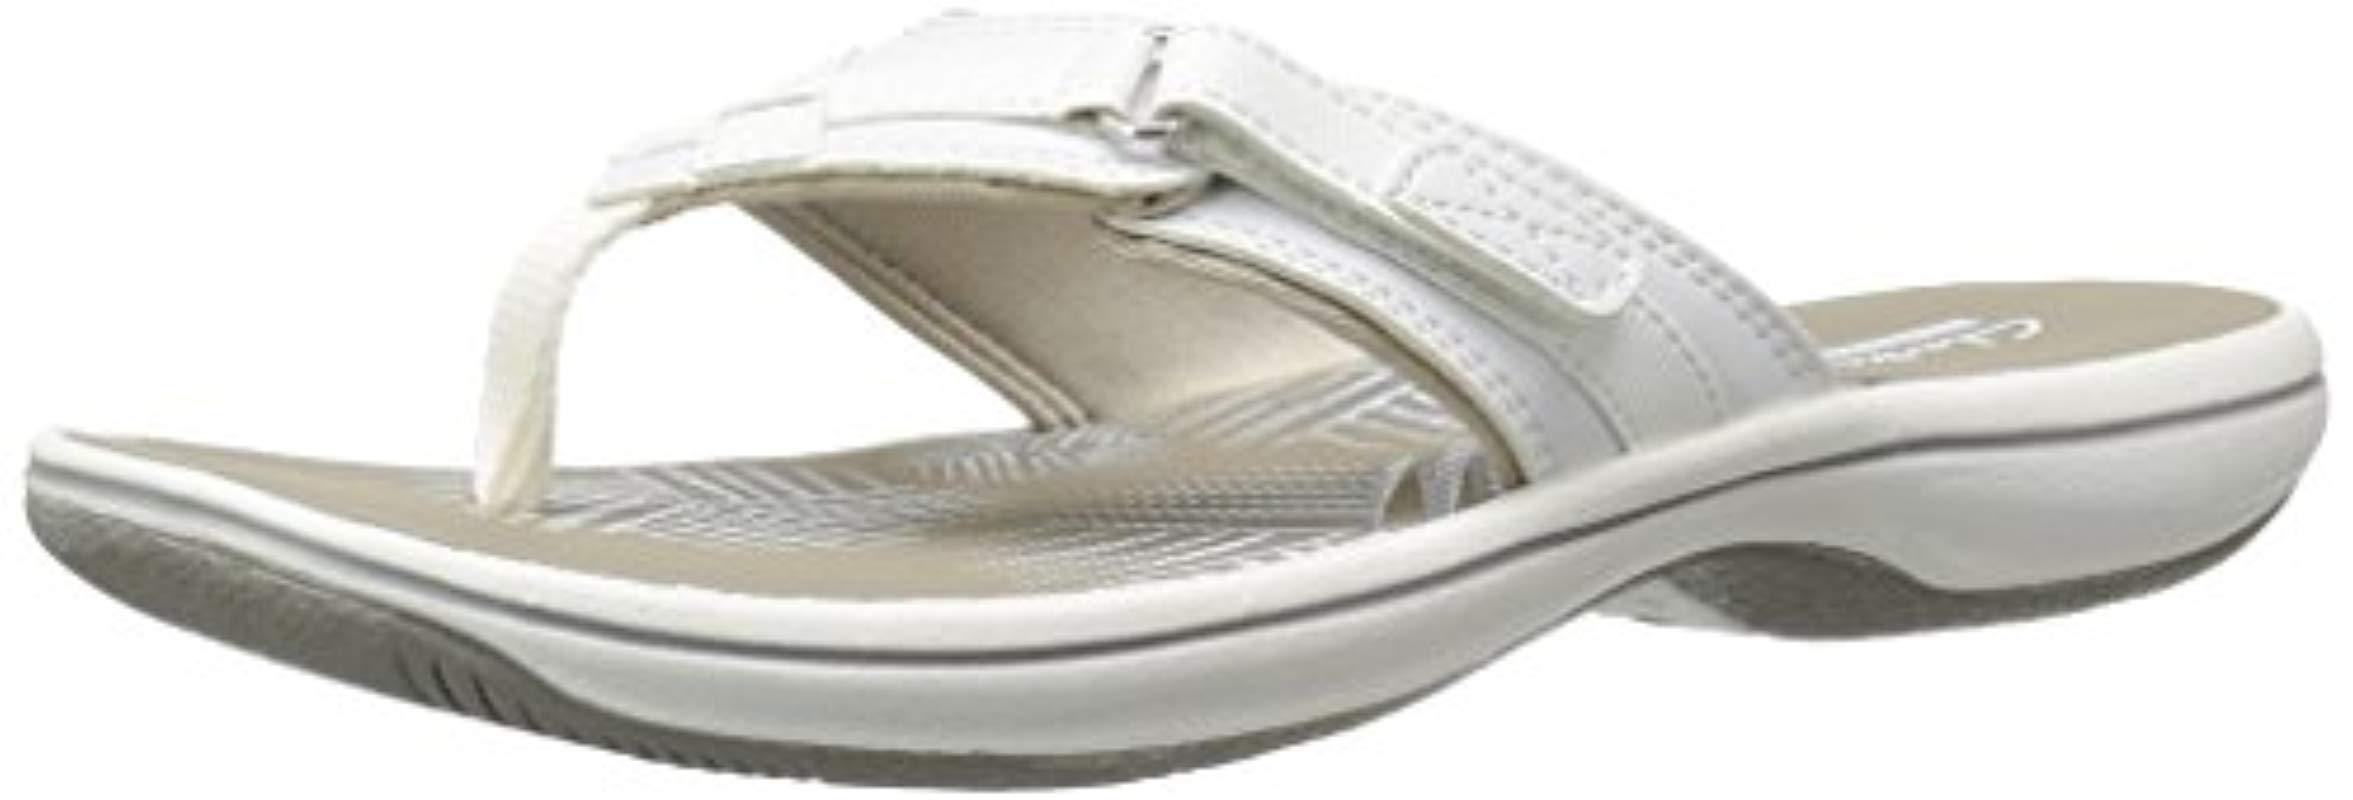 8275609ea Lyst - Clarks Breeze Sea Flip-flop in White - Save 35%